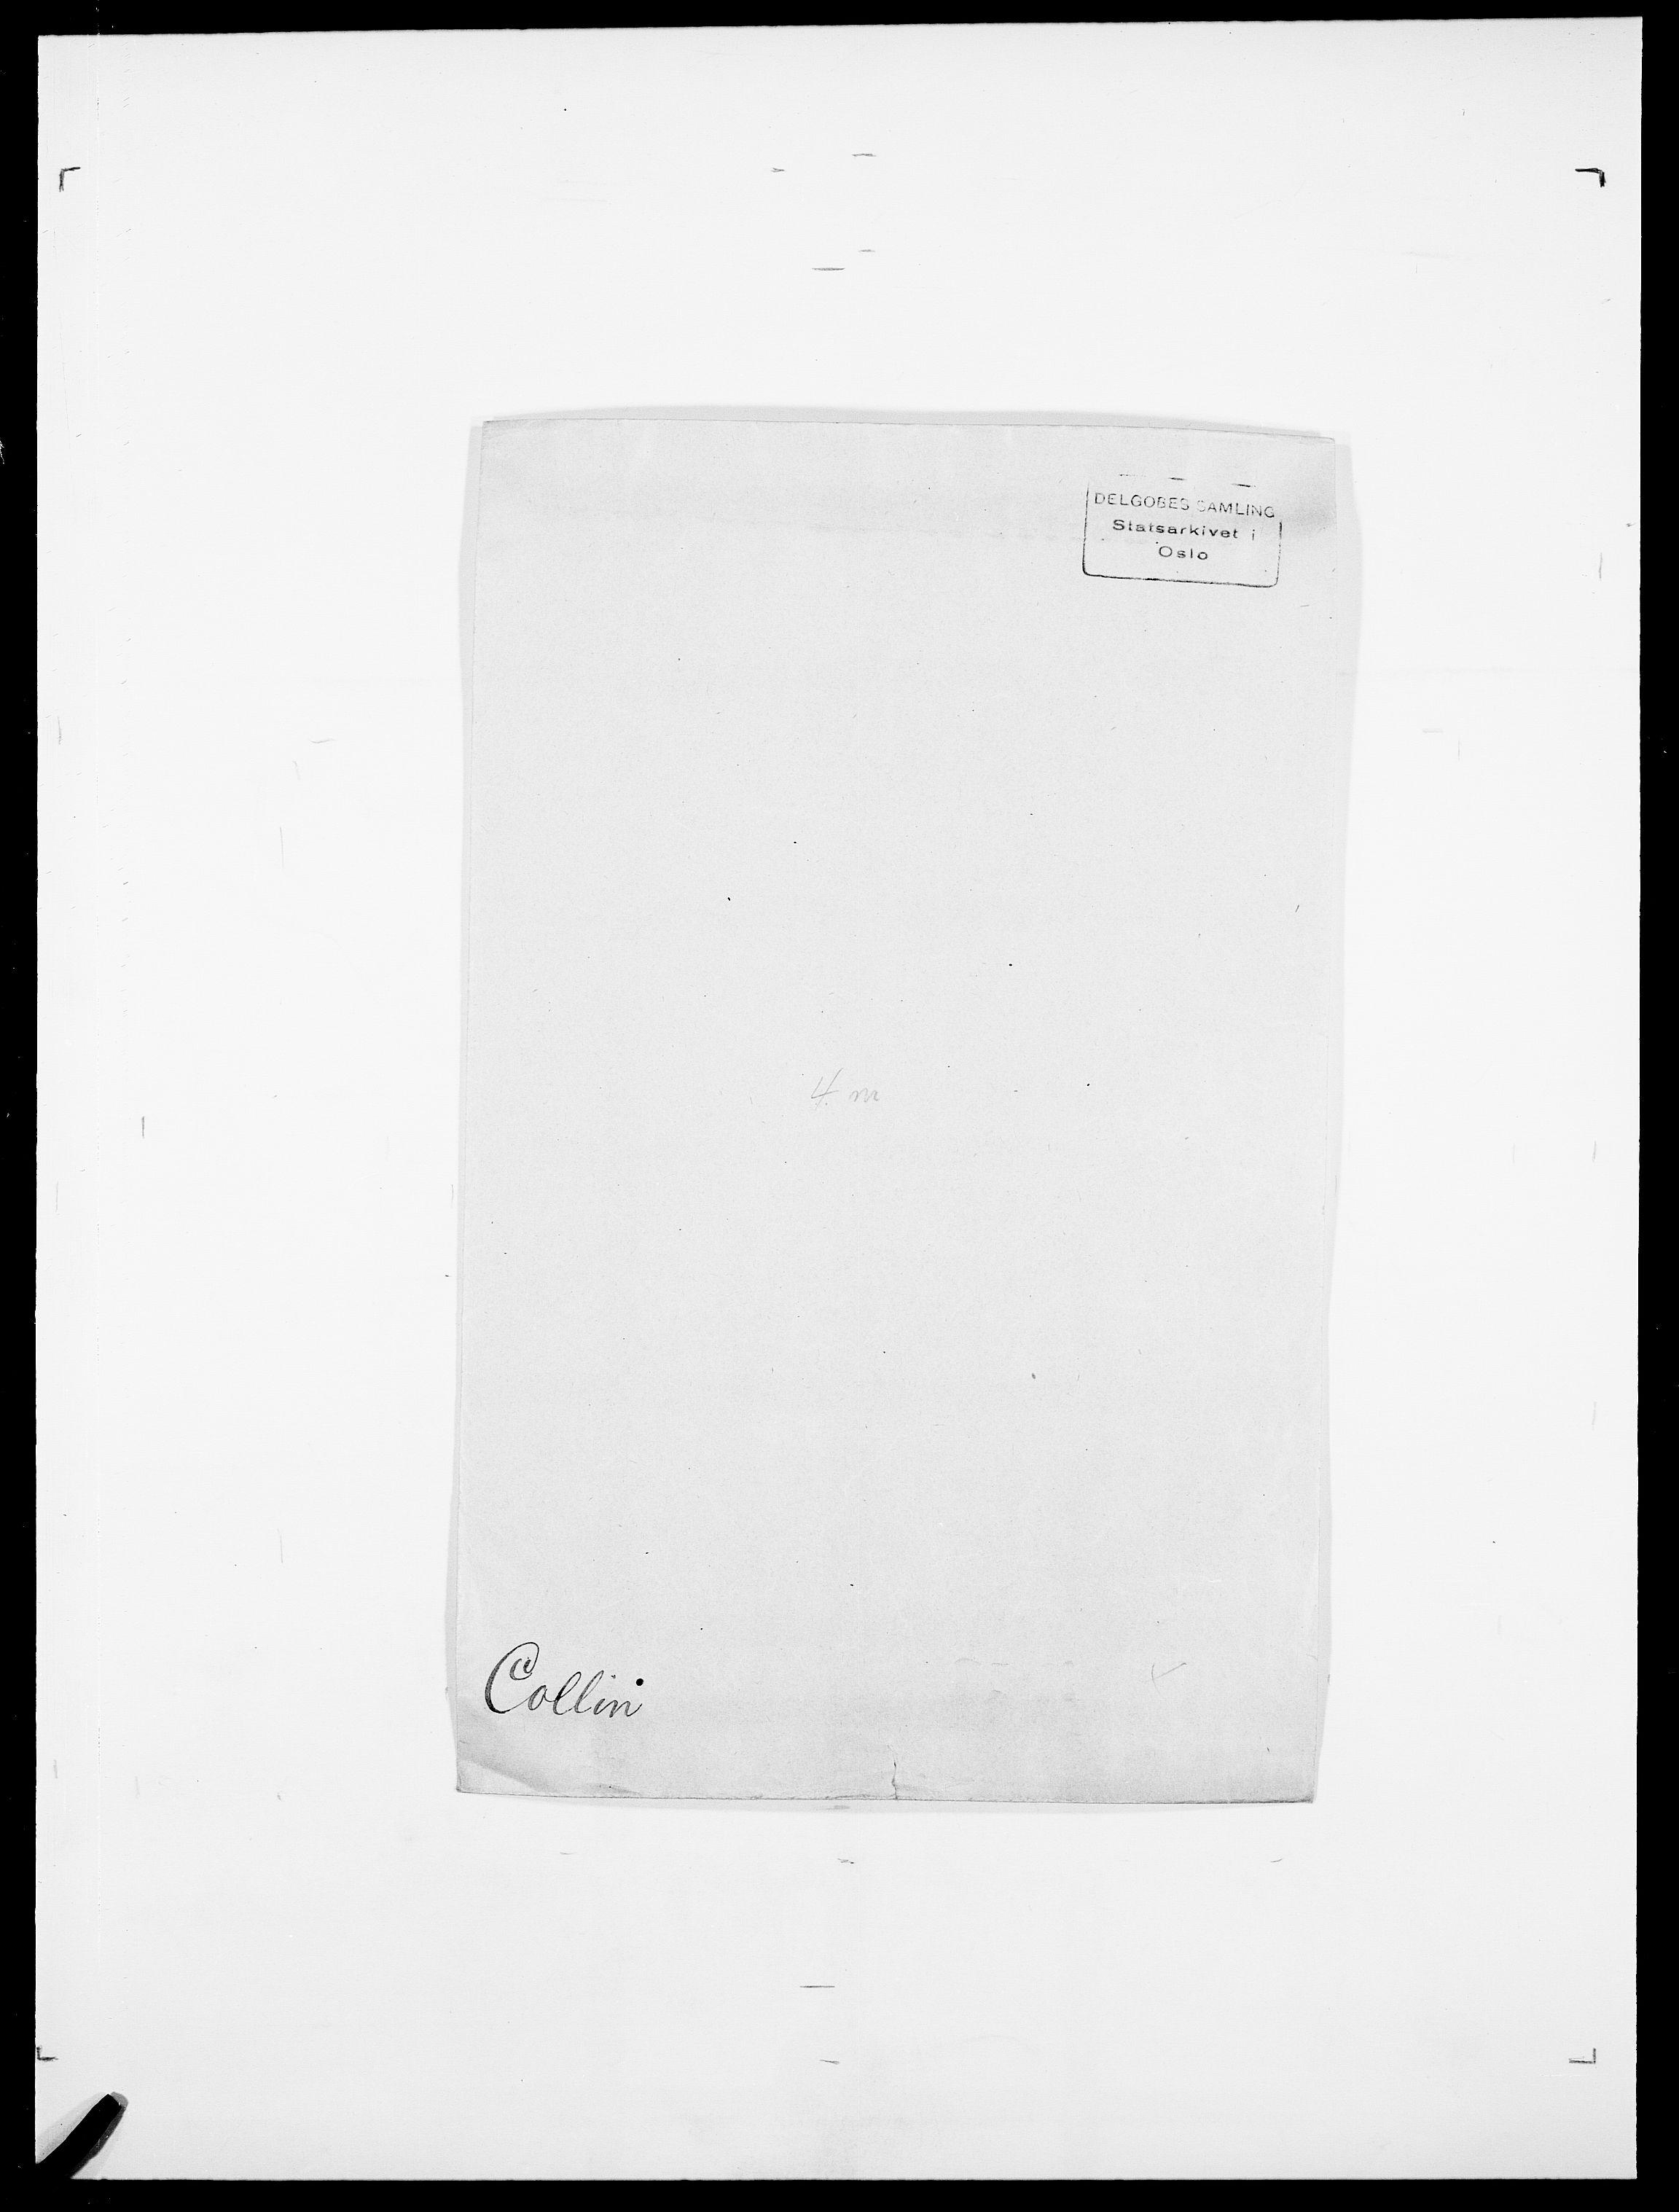 SAO, Delgobe, Charles Antoine - samling, D/Da/L0008: Capjon - Dagenbolt, s. 475